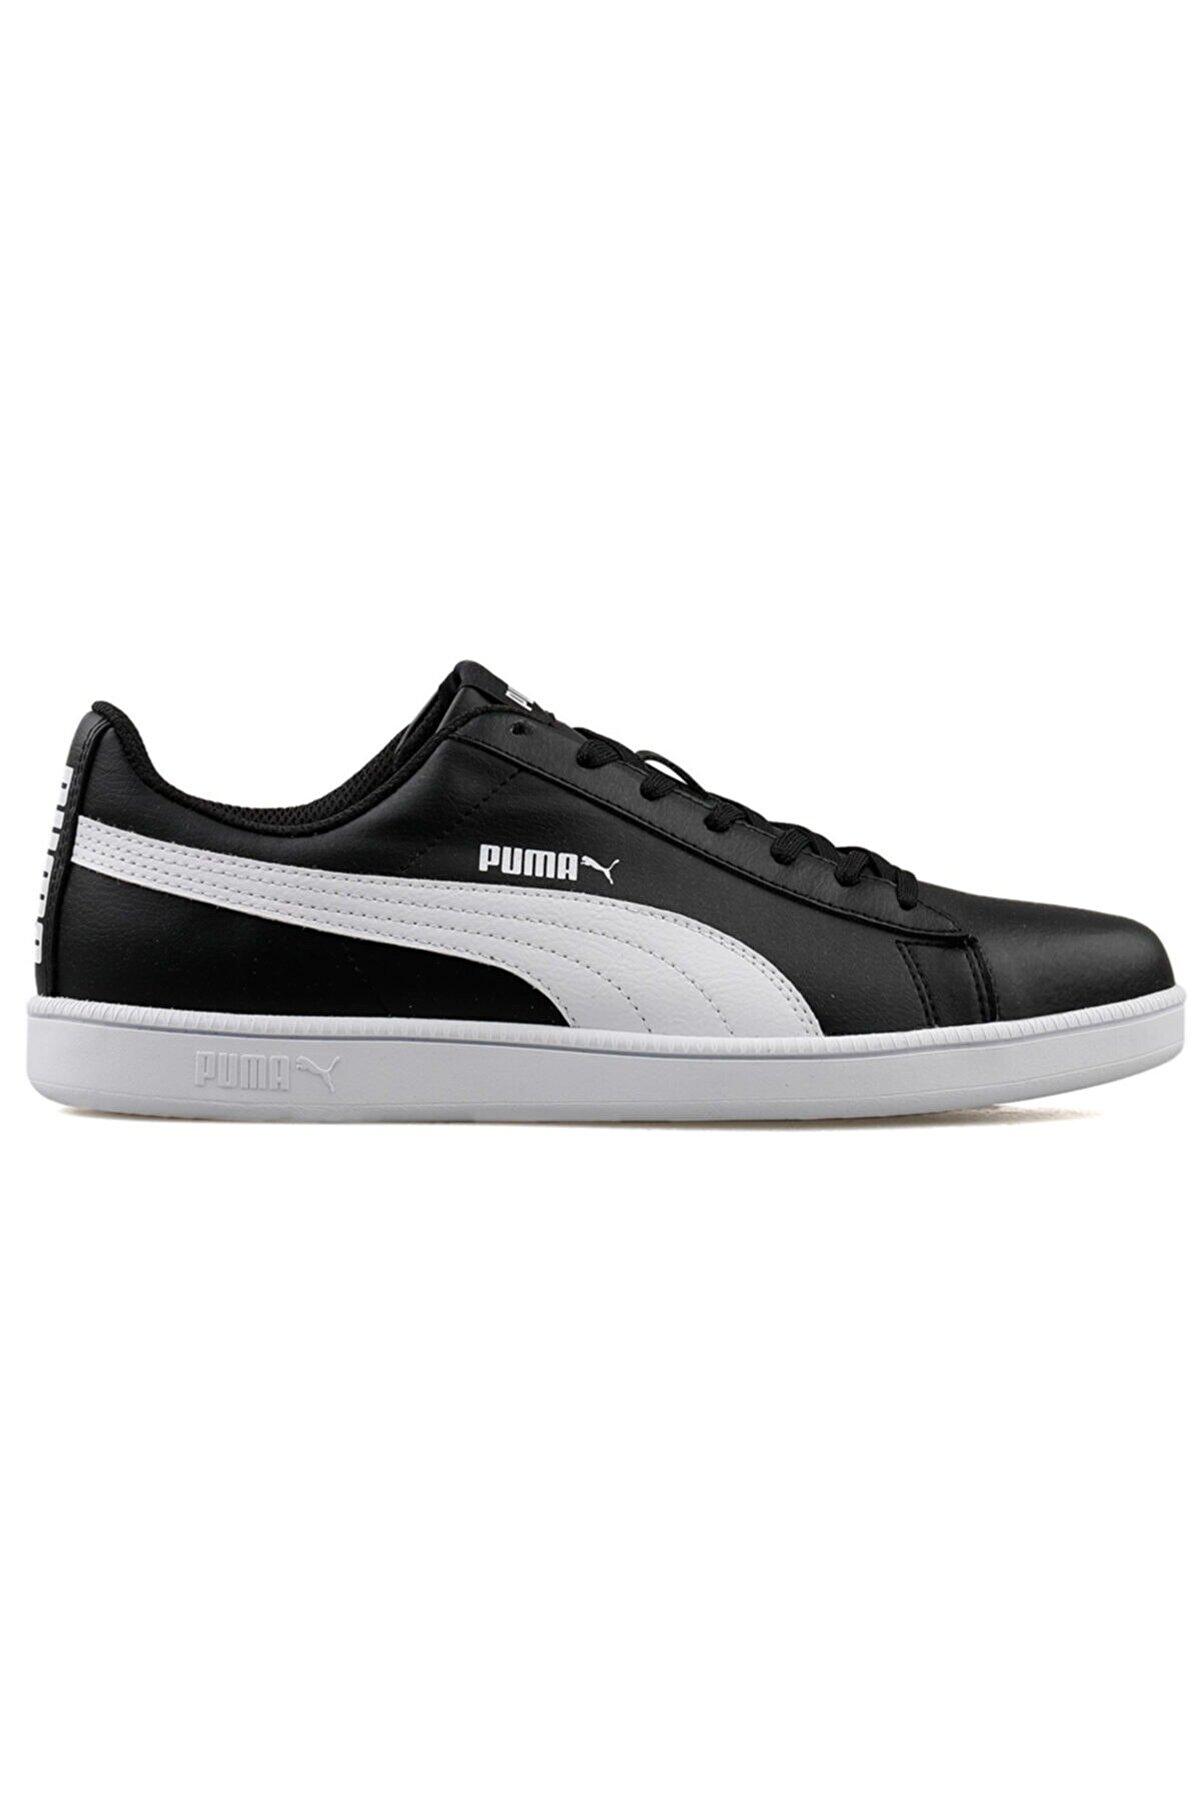 Puma UP TDP Siyah Erkek Sneaker Ayakkabı 101085513